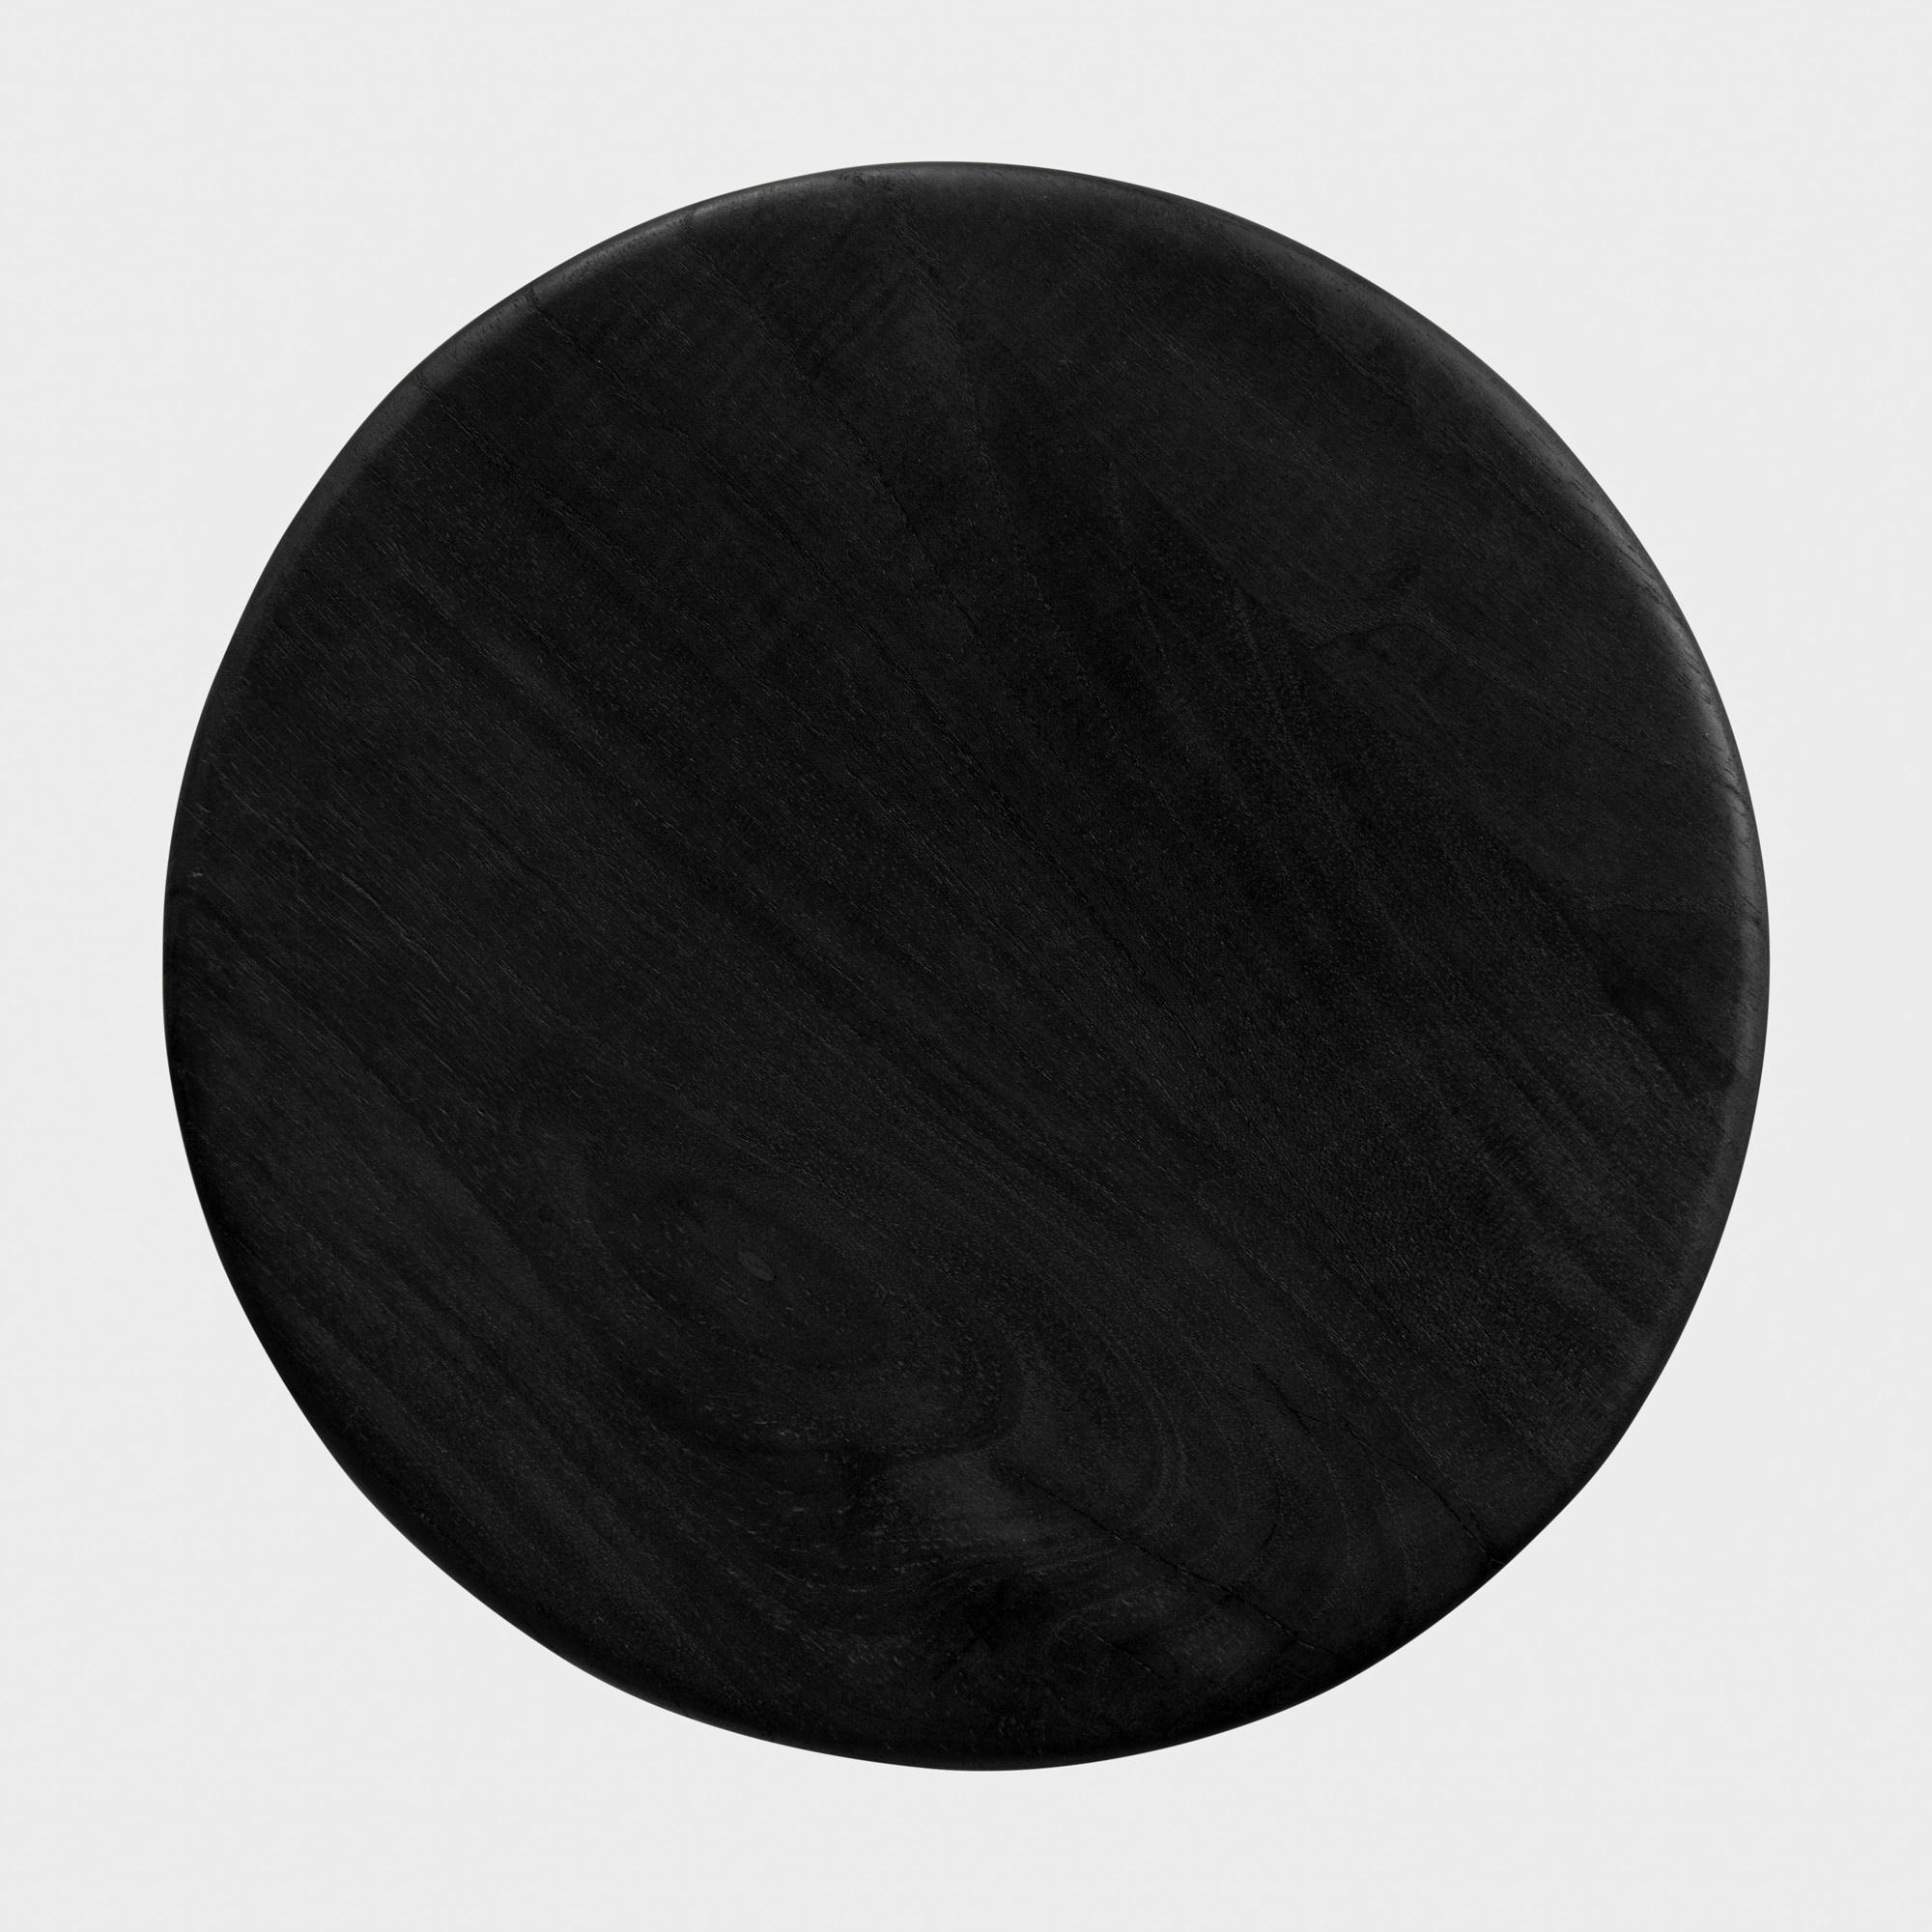 Charles M - Charcoal Black-3